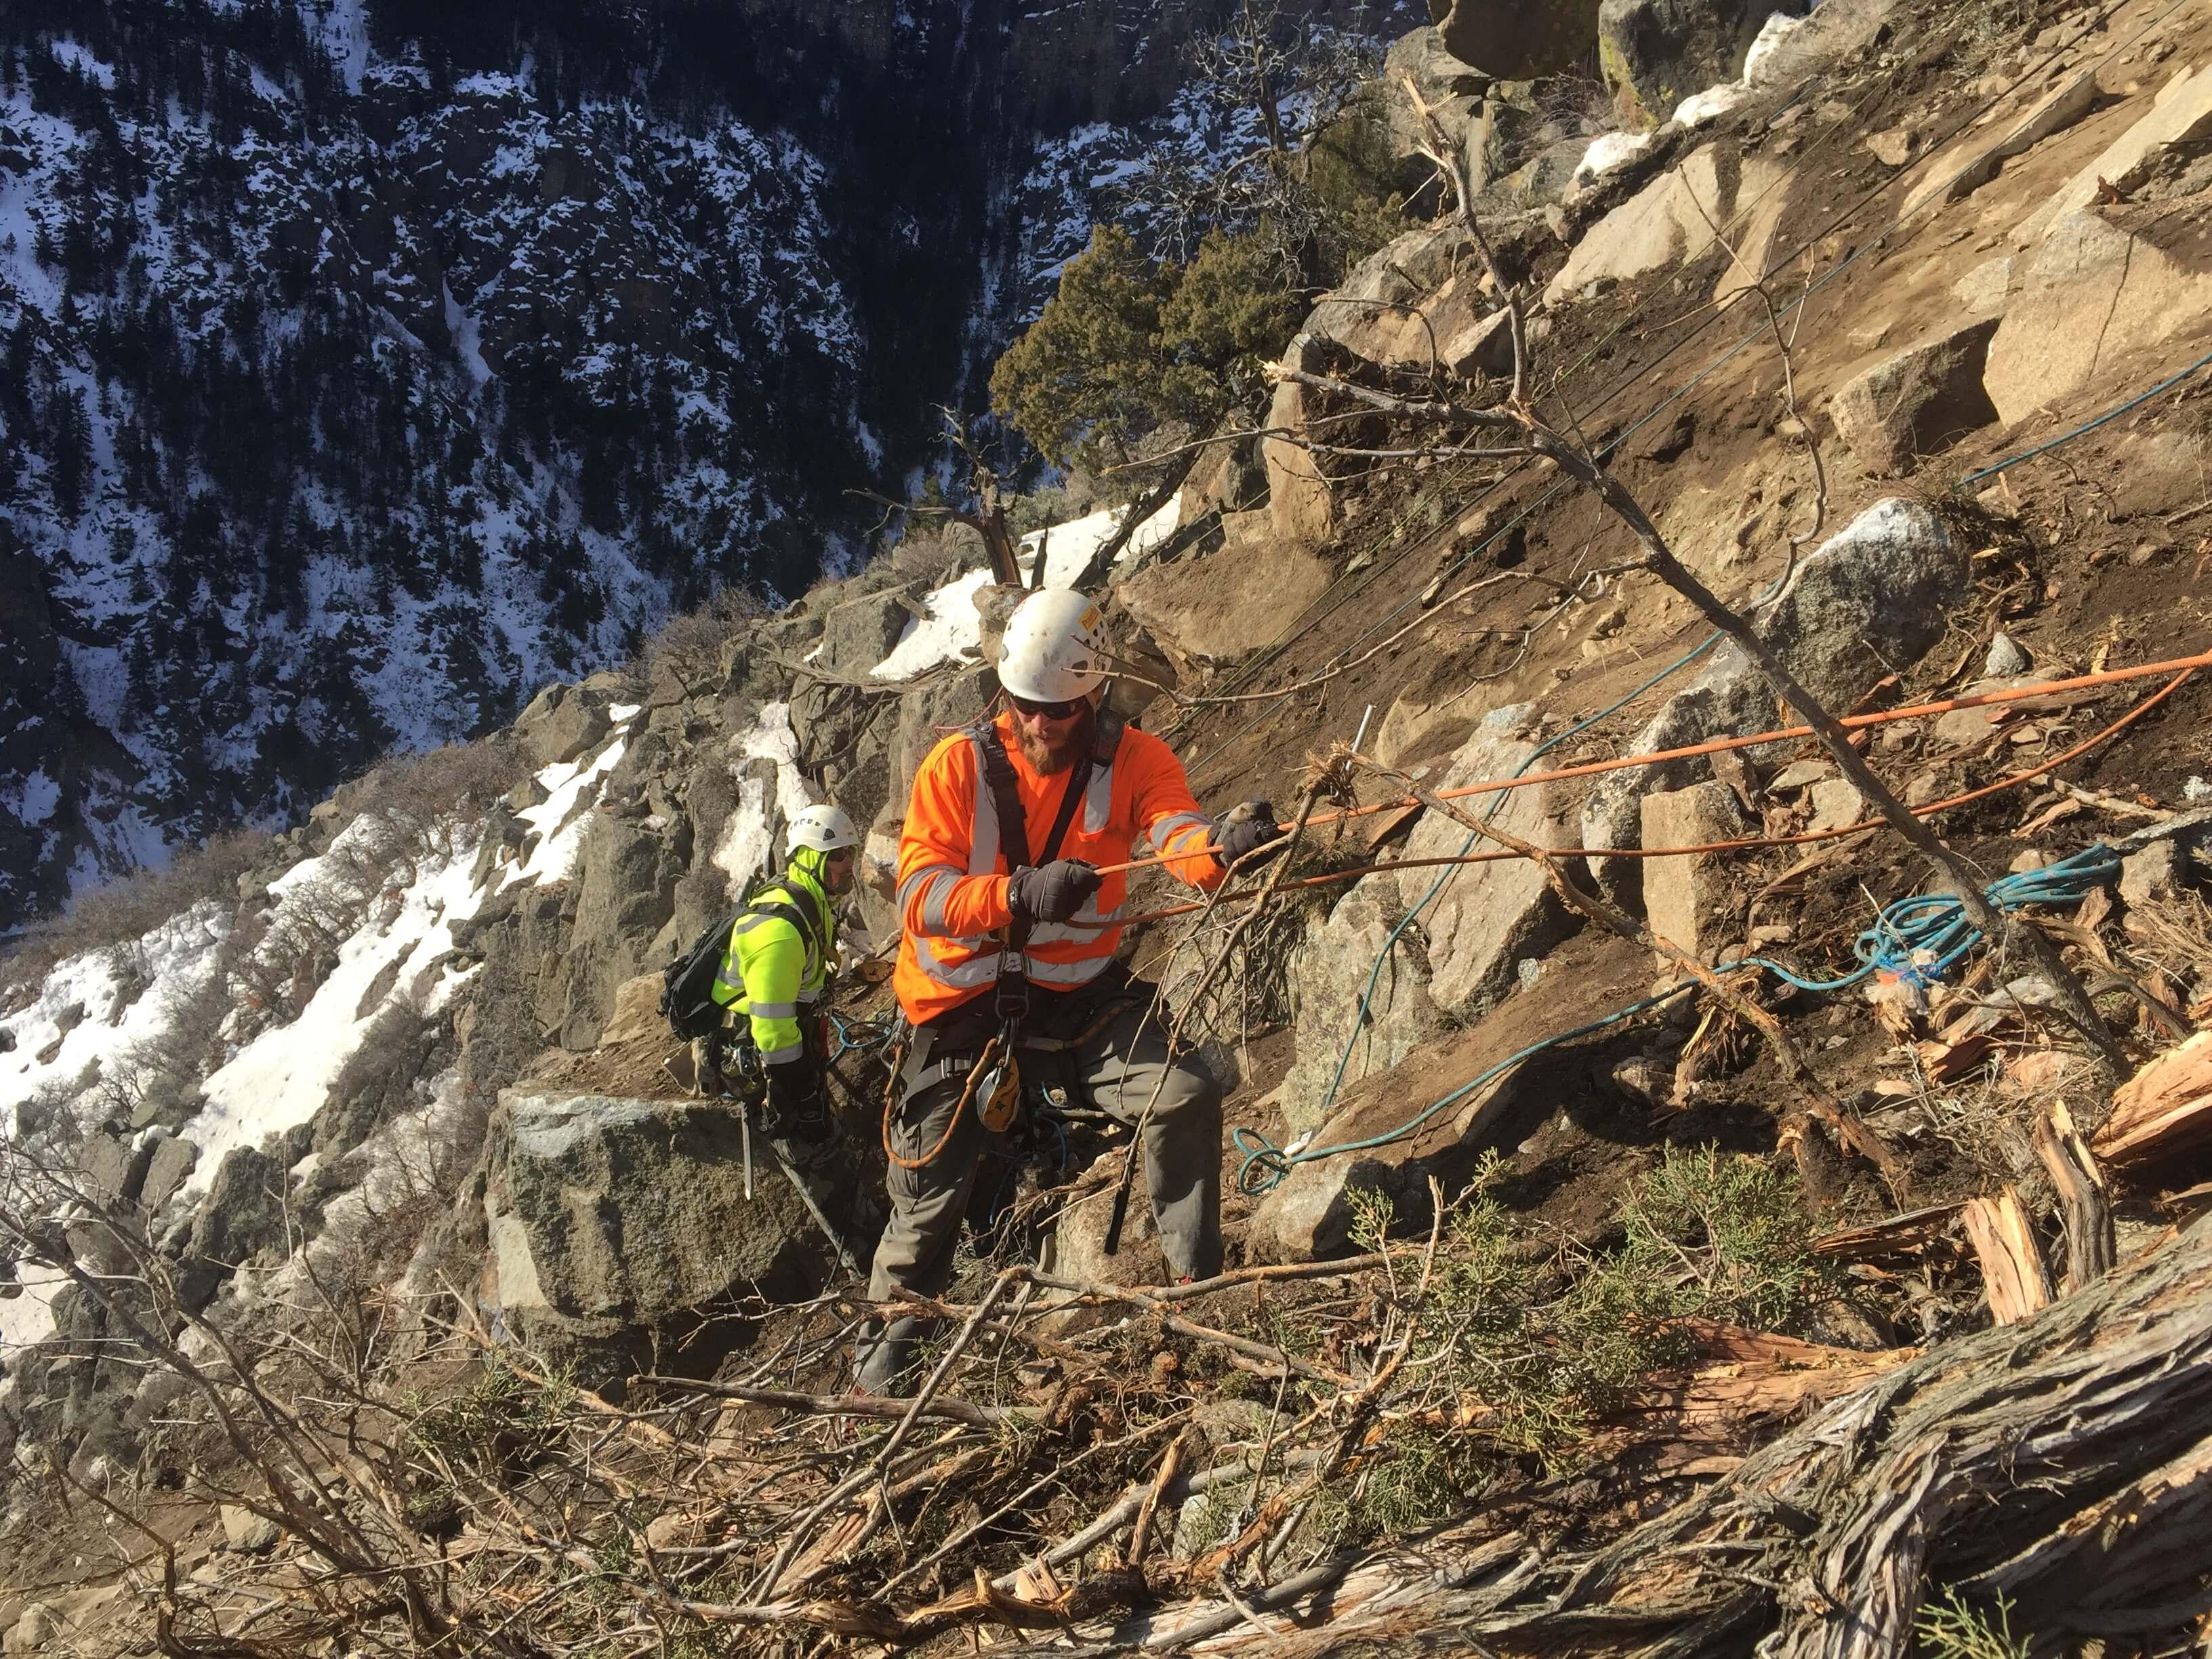 I-70 Rockfall Stabilization